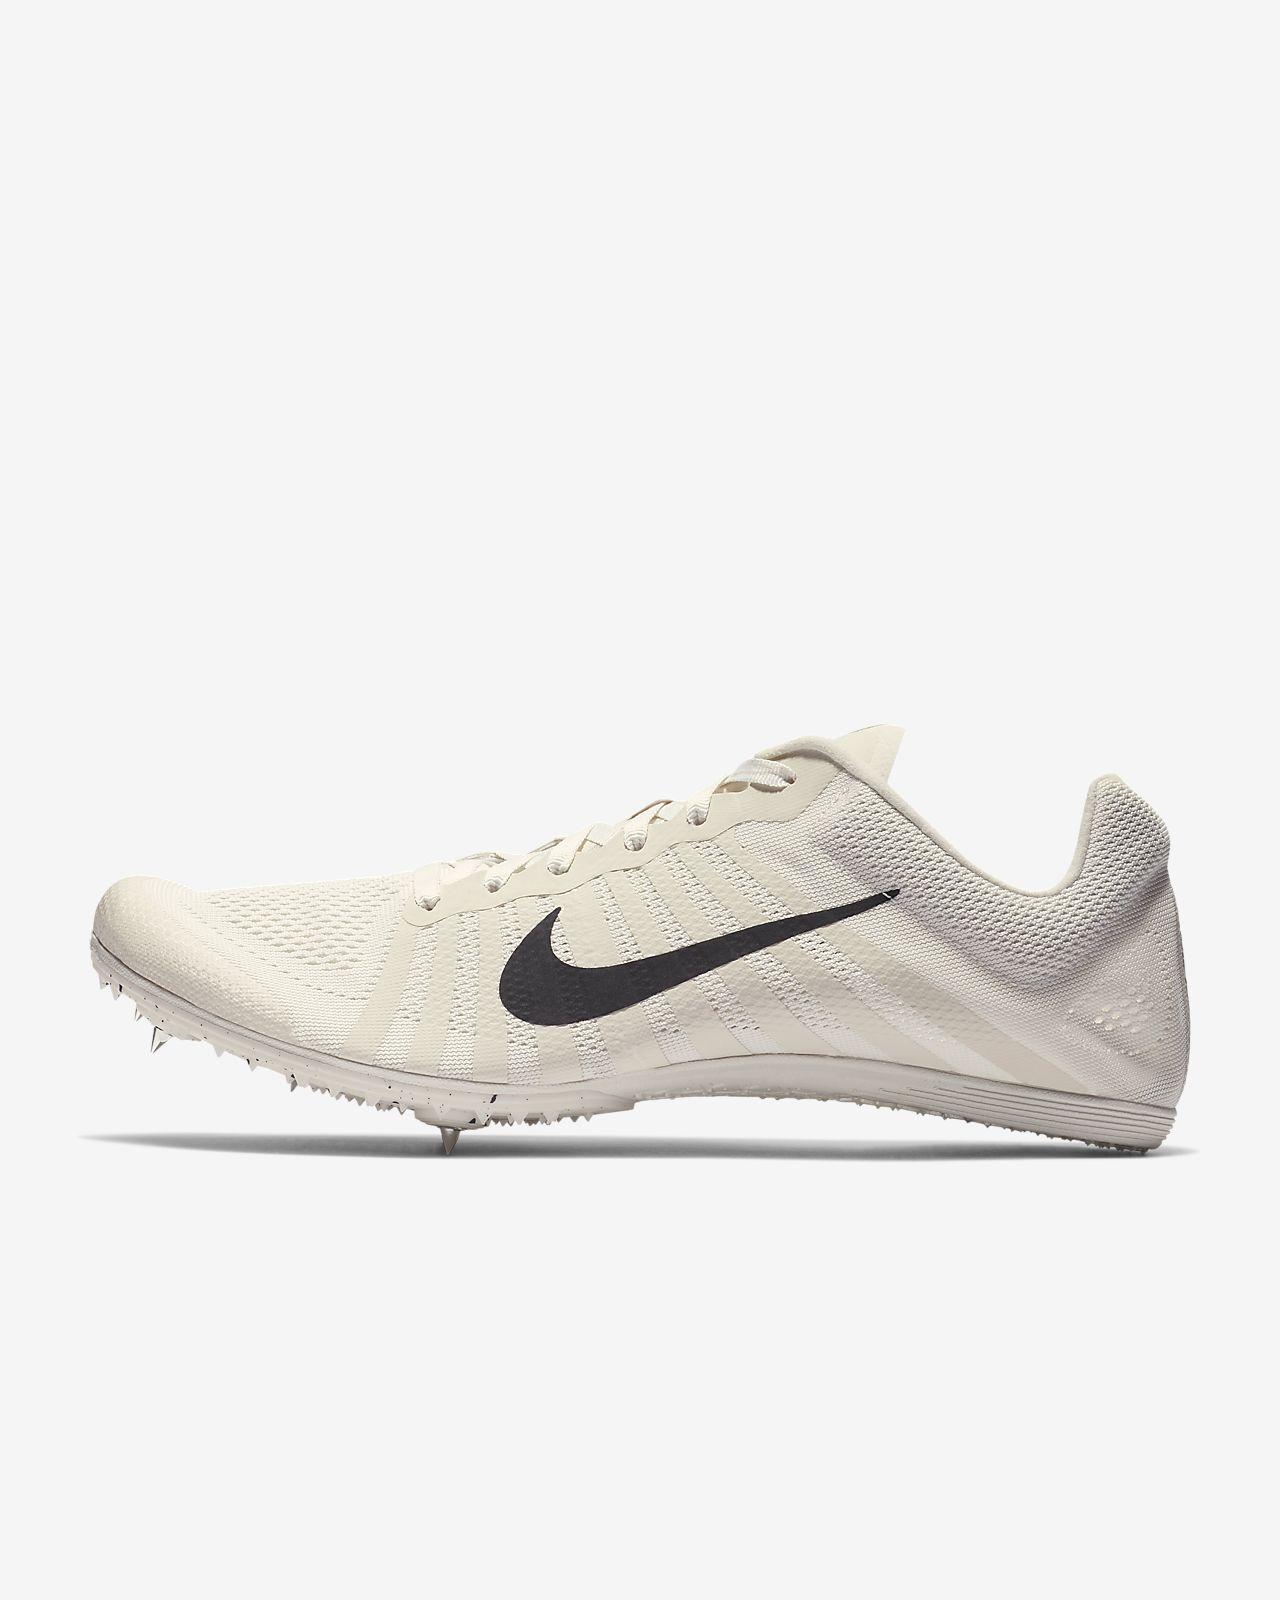 1cb7cb6d6667 Calzado de carrera de distancia con clavos unisex Nike Zoom D. Nike ...